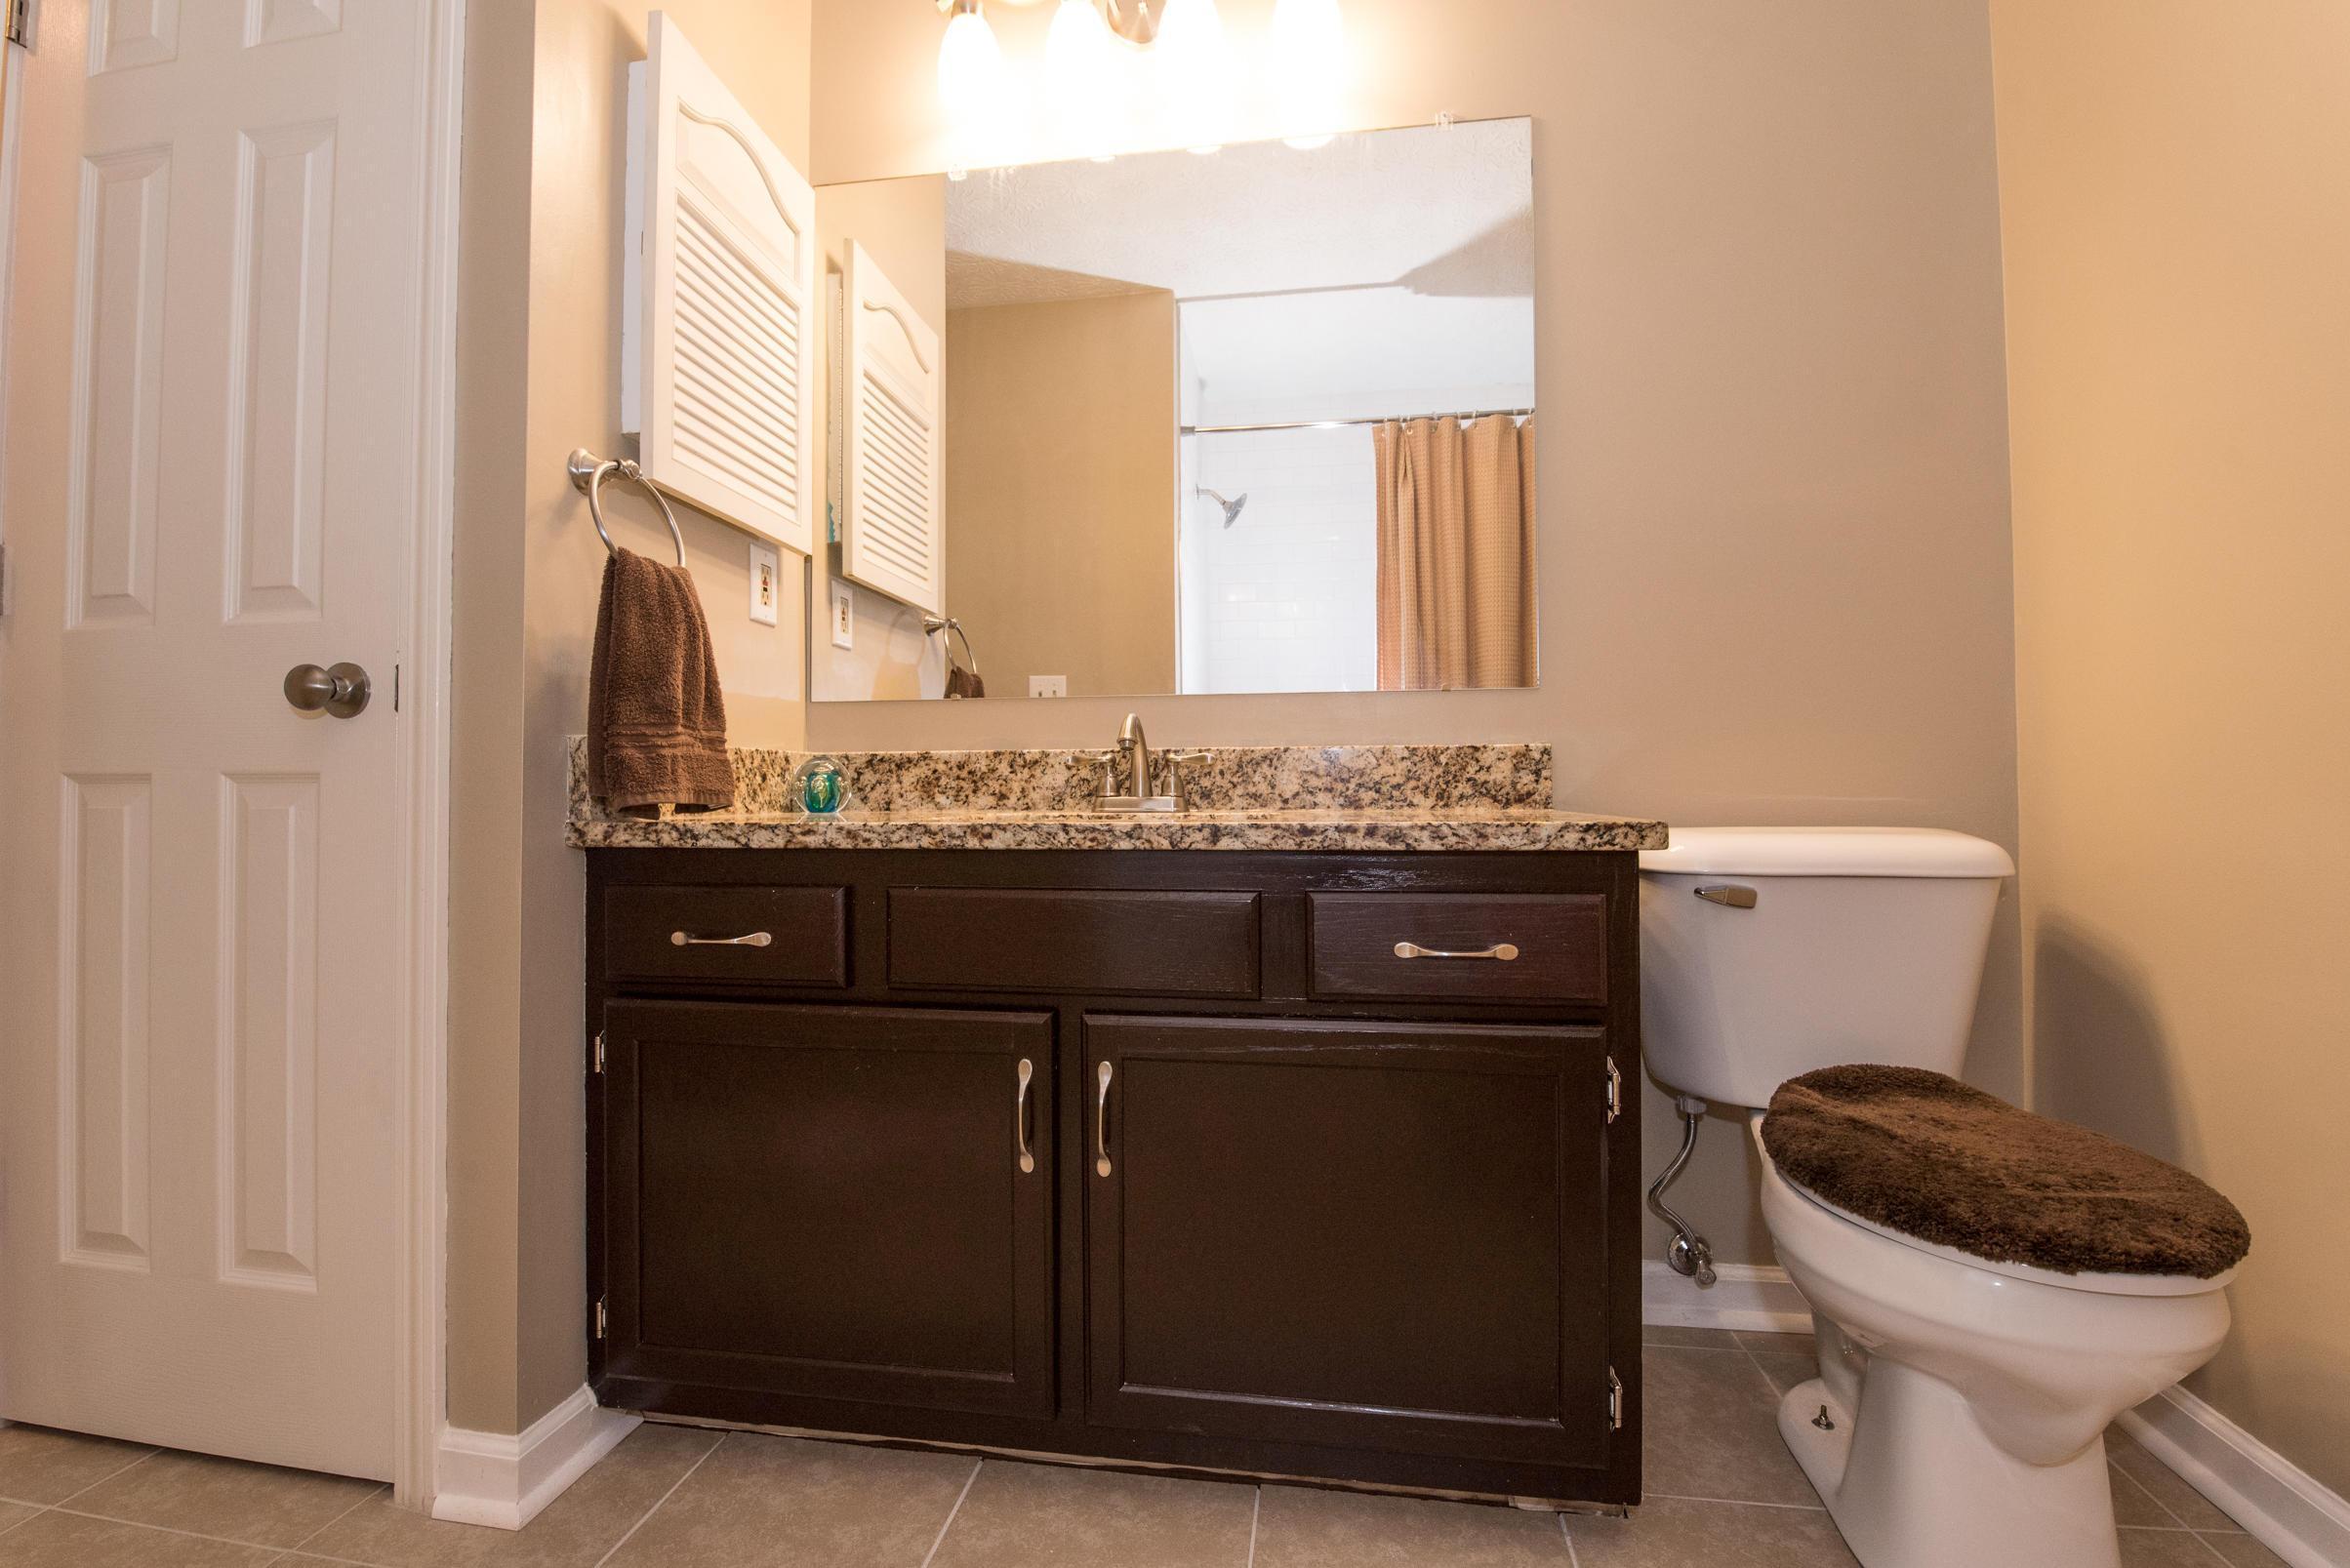 854 Summertree Lane, Westerville, Ohio 43081, 4 Bedrooms Bedrooms, ,3 BathroomsBathrooms,Residential,For Sale,Summertree,220031409